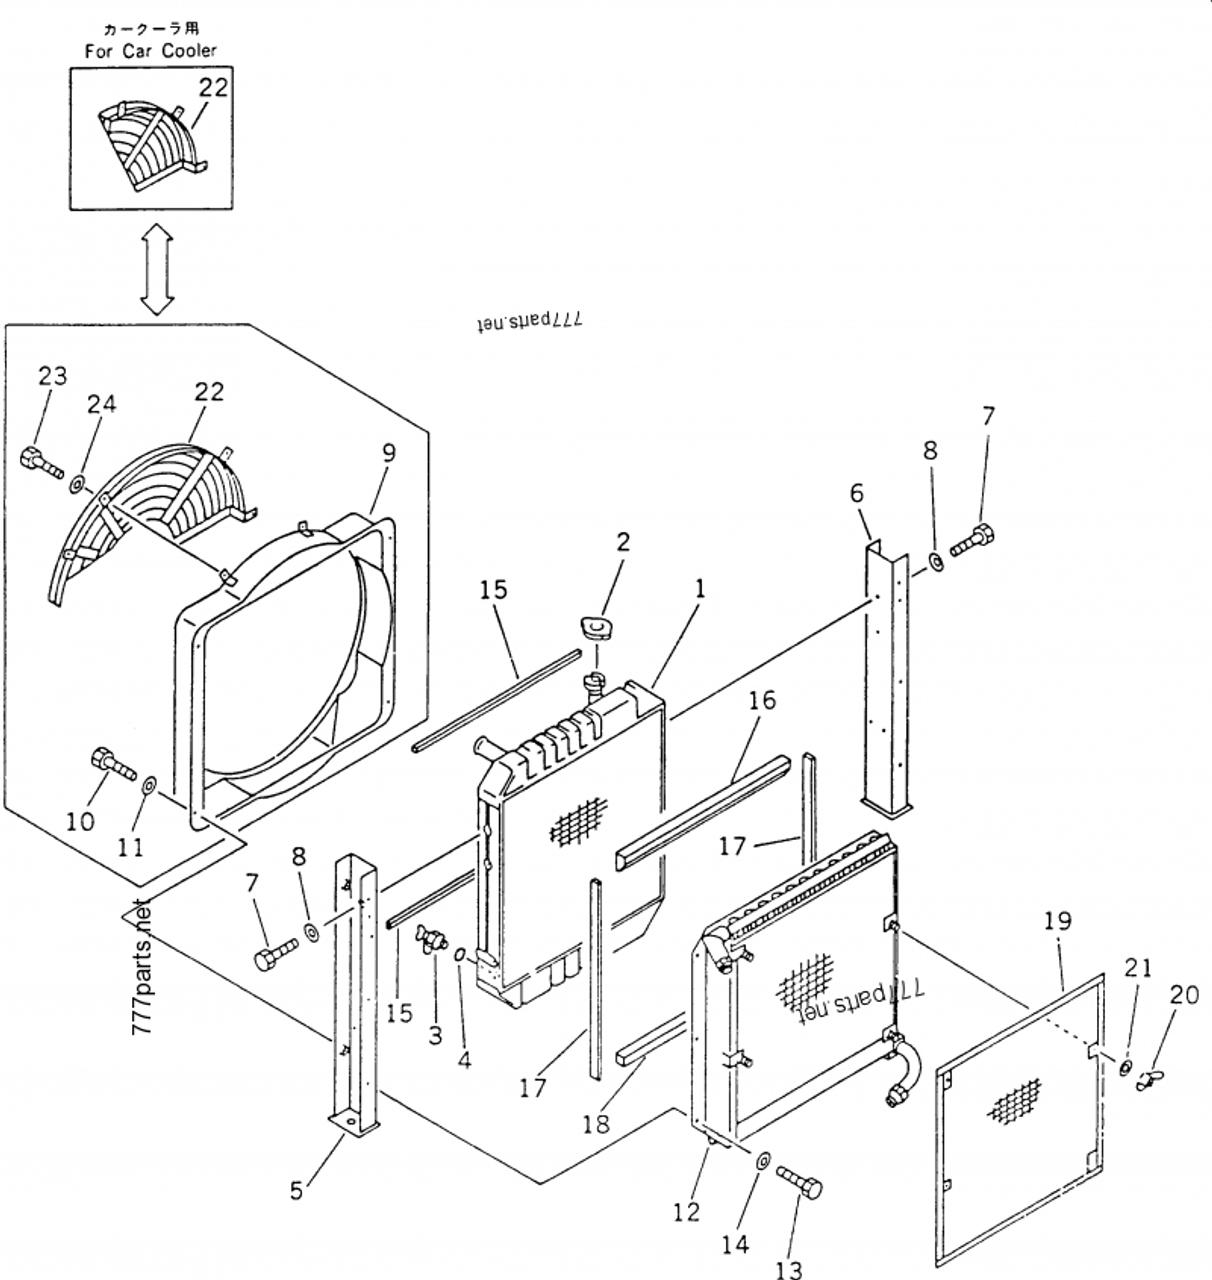 20x 03 31110 Oil Cooler Hydarulic Fits For Komatsu Pc60 6 Pc70 6